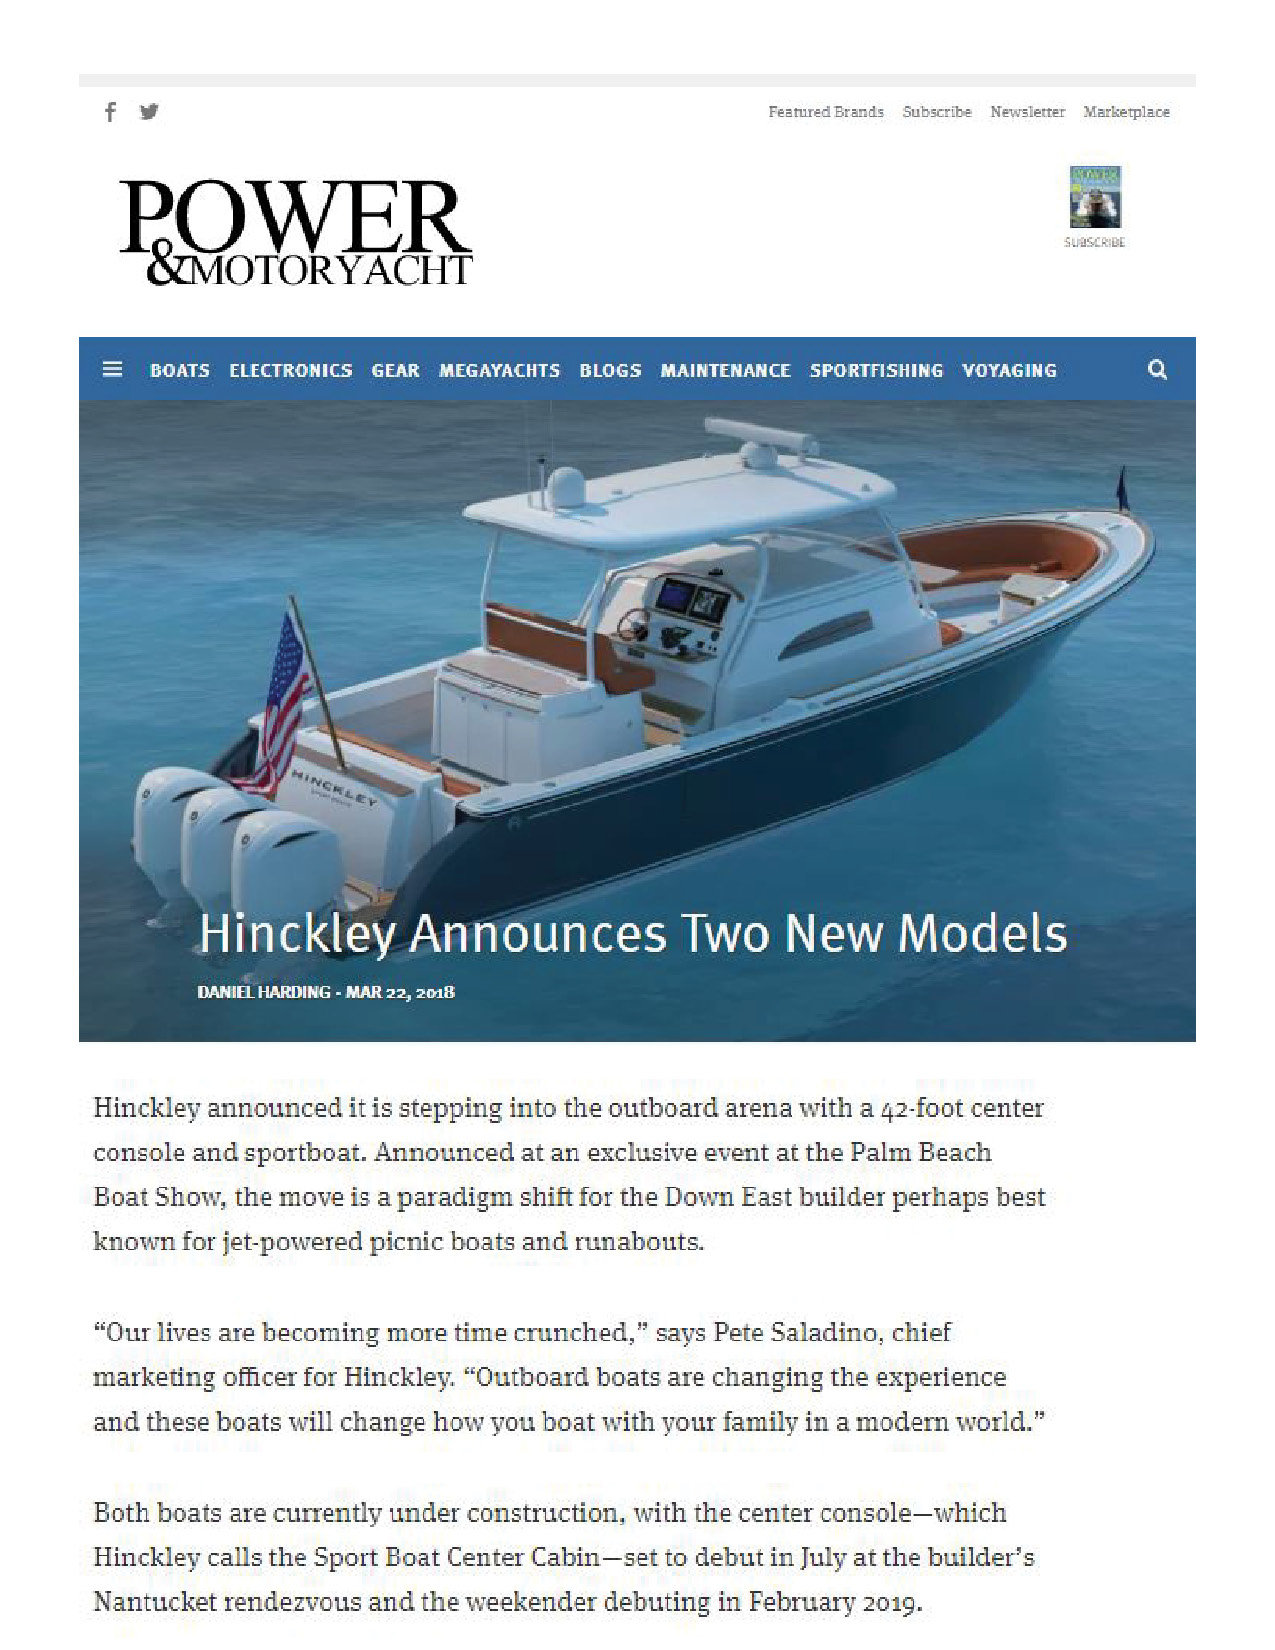 Hinckley Sport Boats Featured on Power & Motoryacht